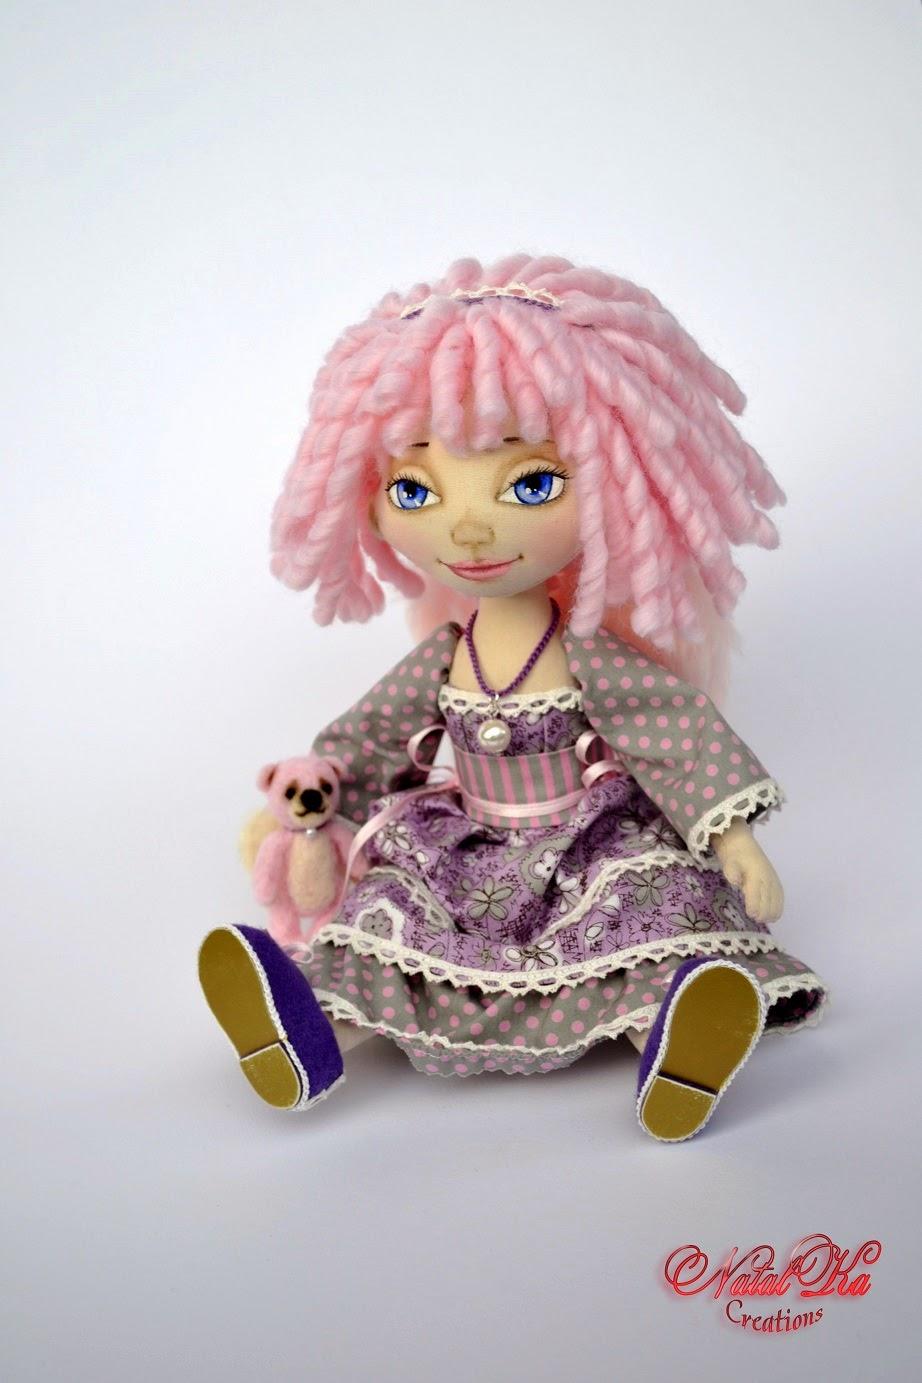 Авторская текстильная тряпичная кукла ангел от NatalKa Creations. Cloth art doll handmade by NatalKa Creations